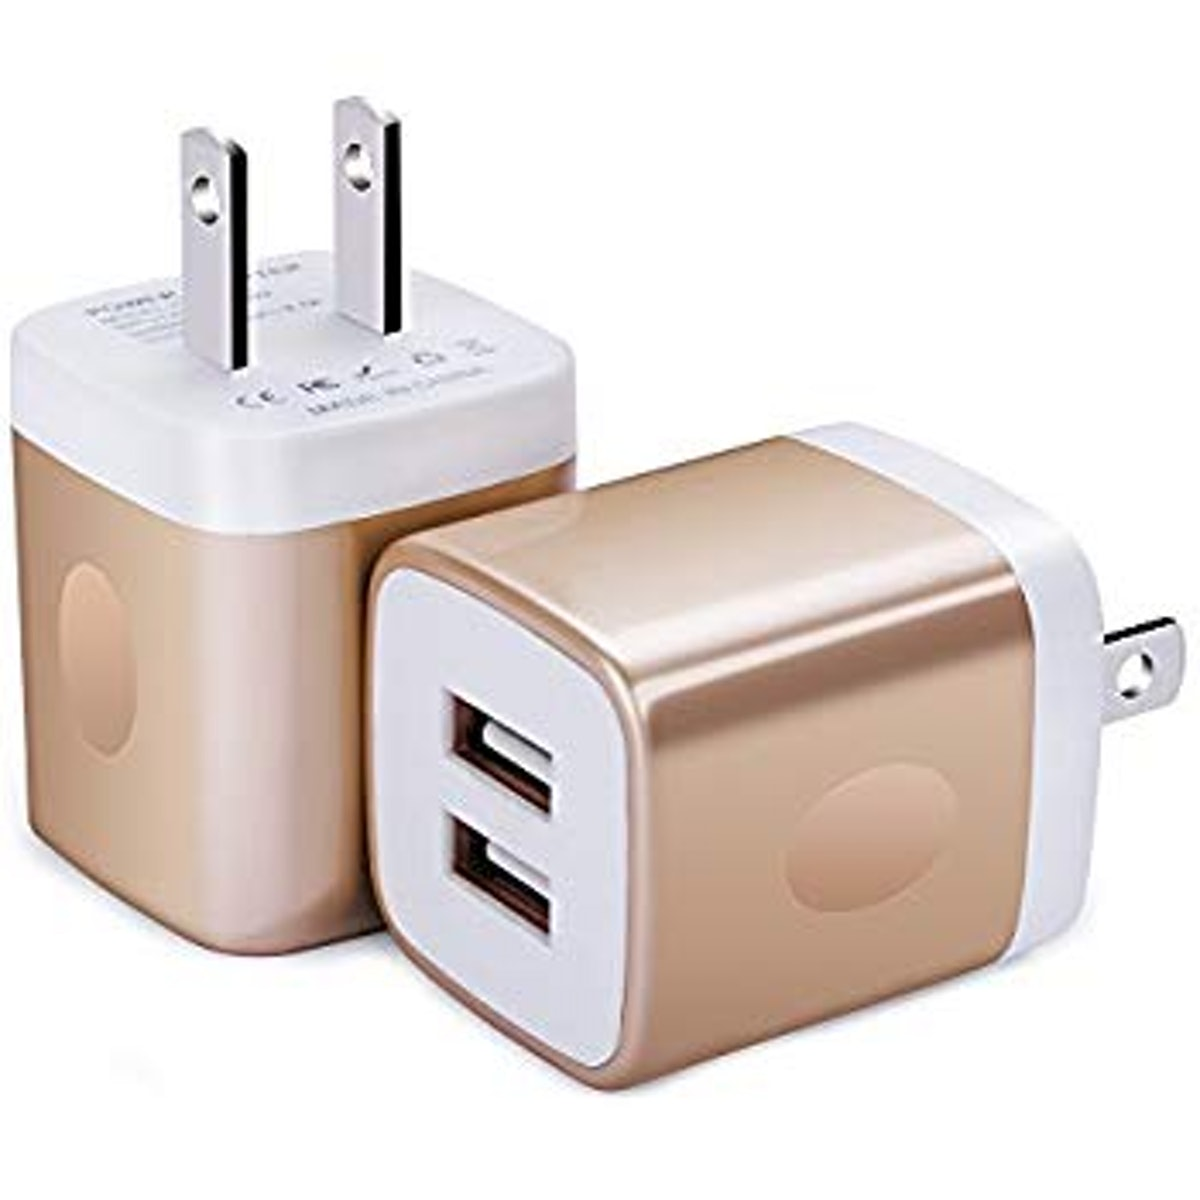 Dual USB Wall Charger